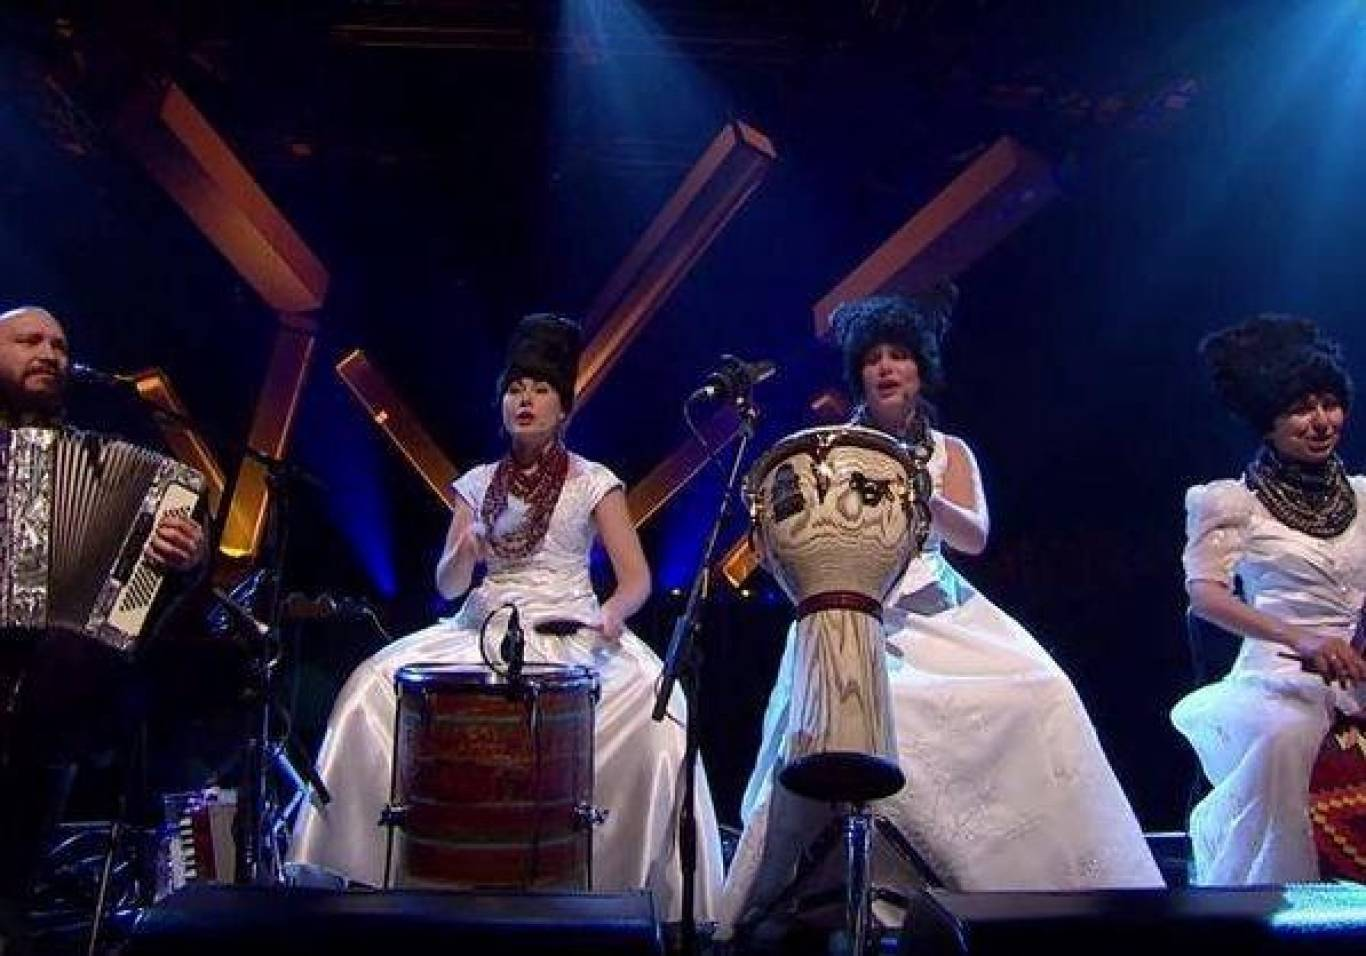 ДахаБраха з концертом у Львові